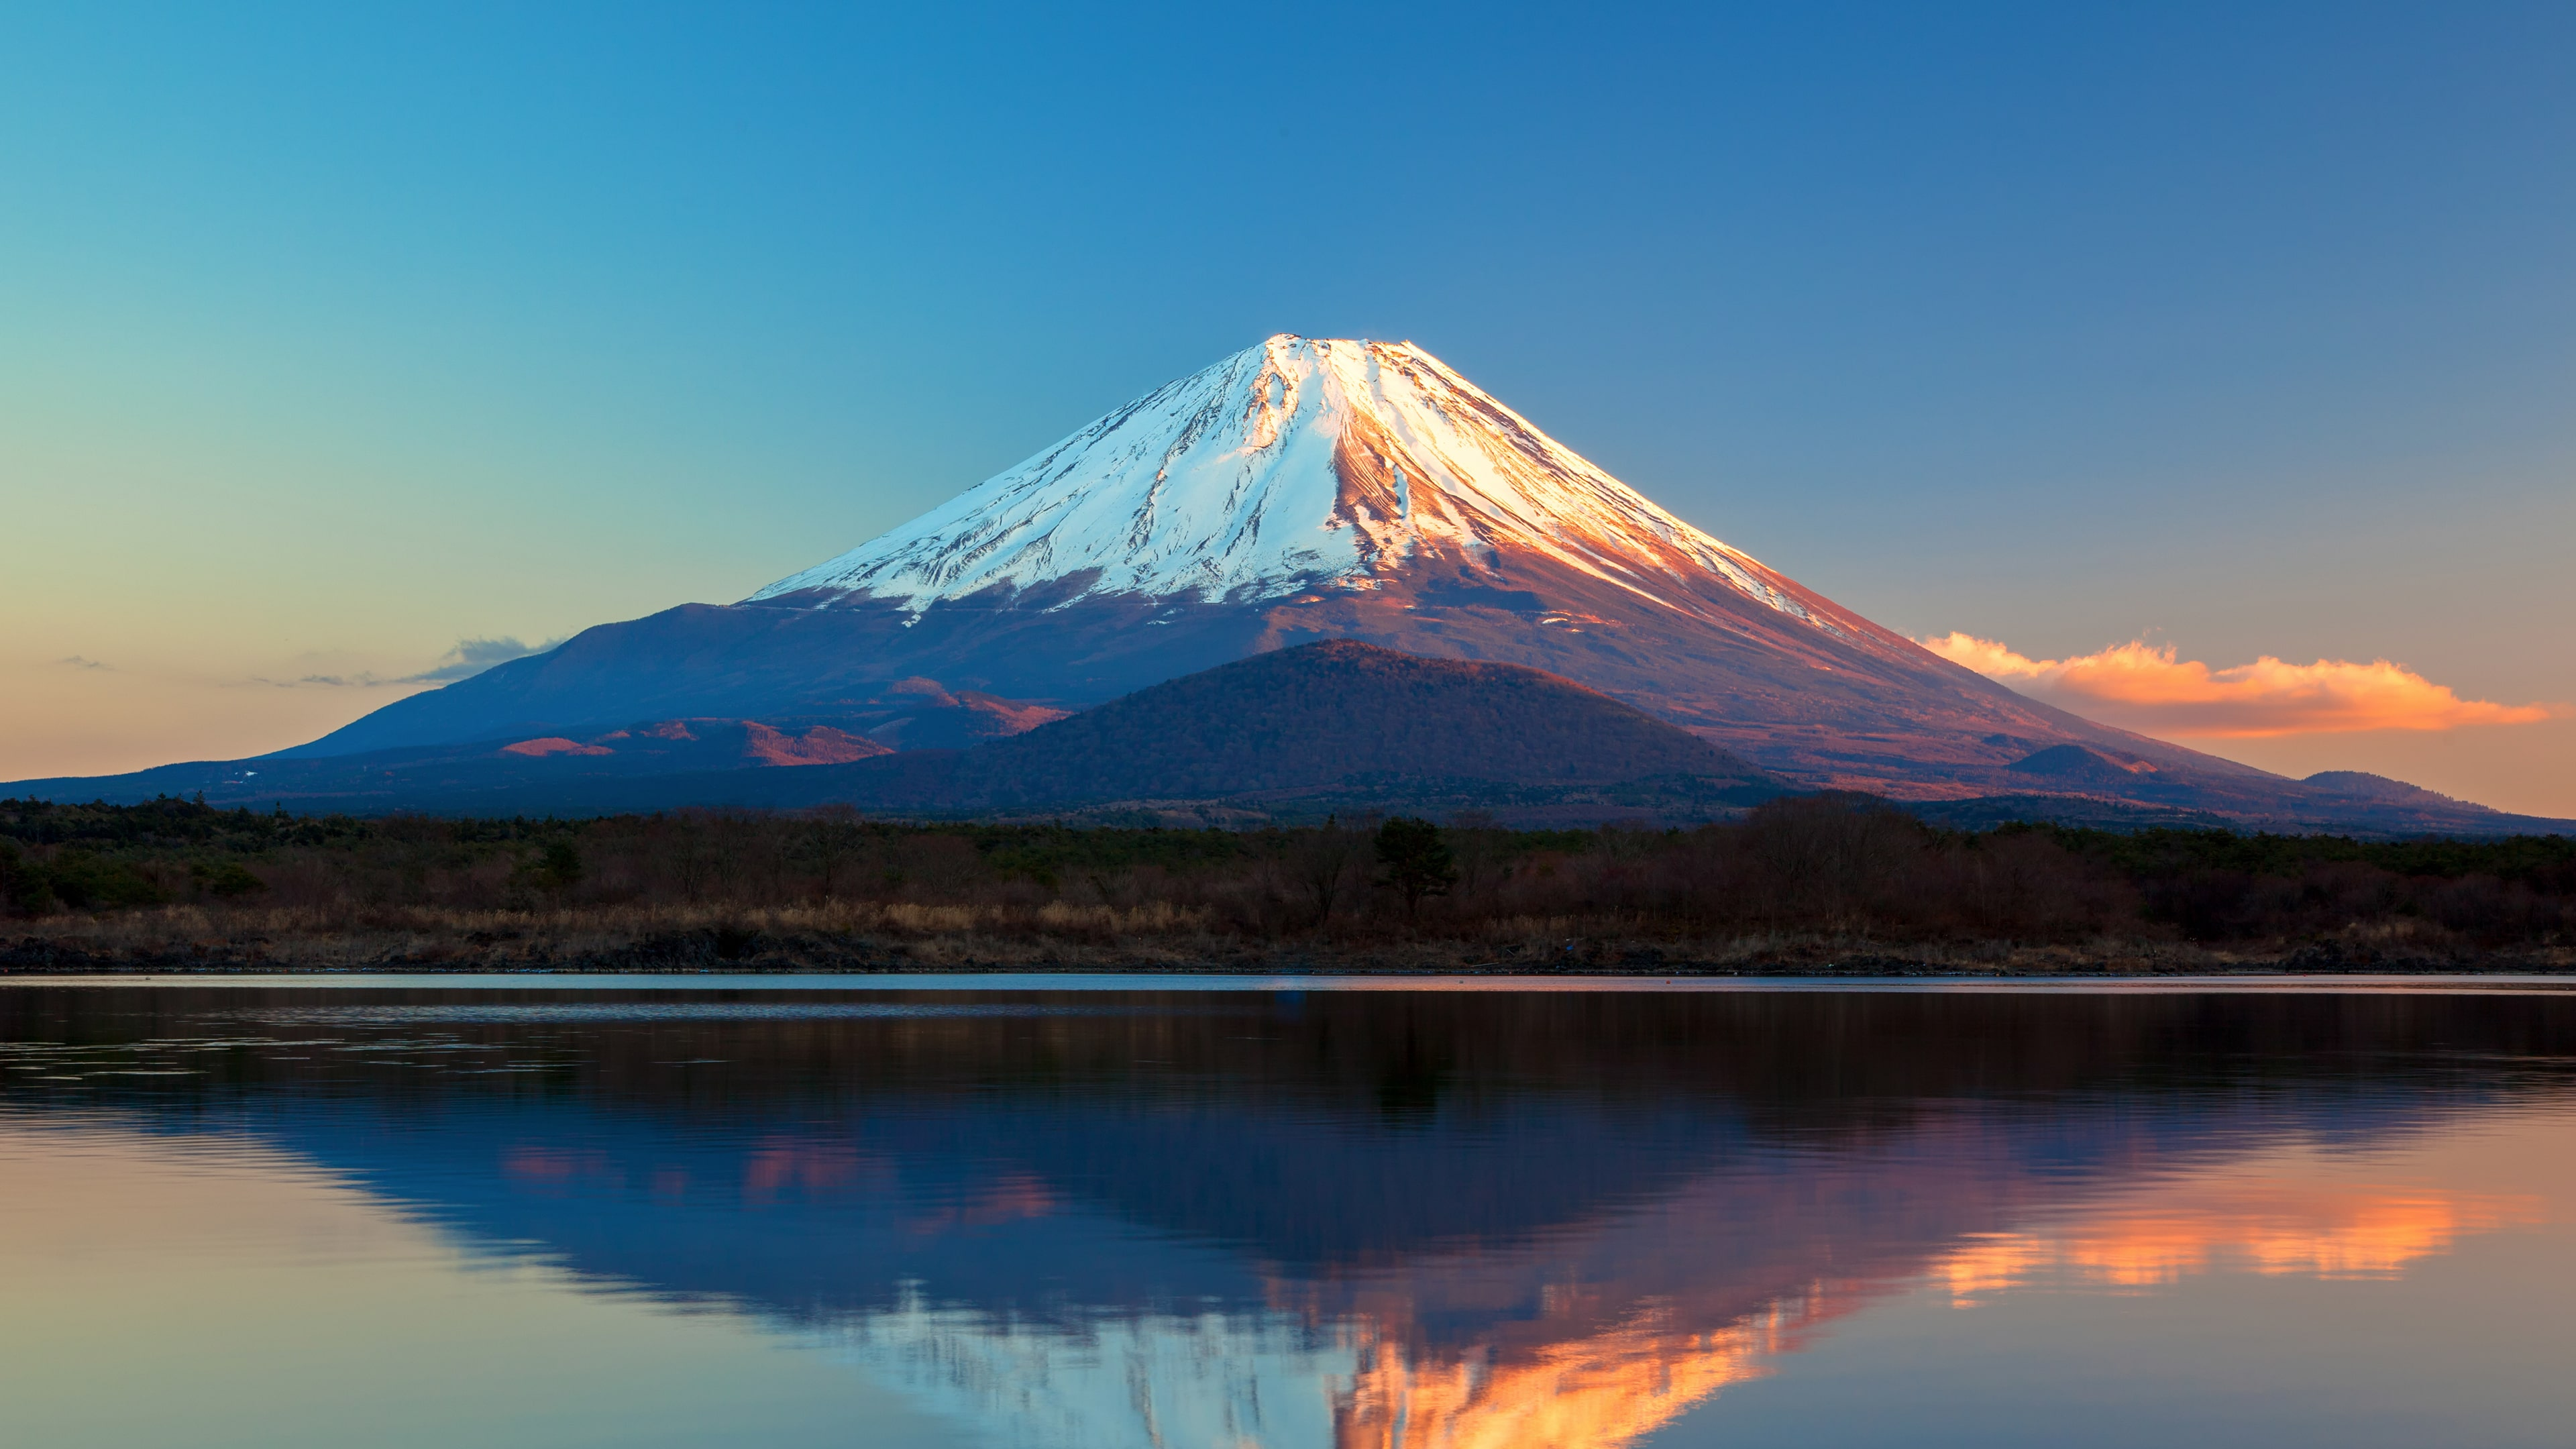 Mt Fuji Cruise Best Cruises From Tokyo To Mt Fuji